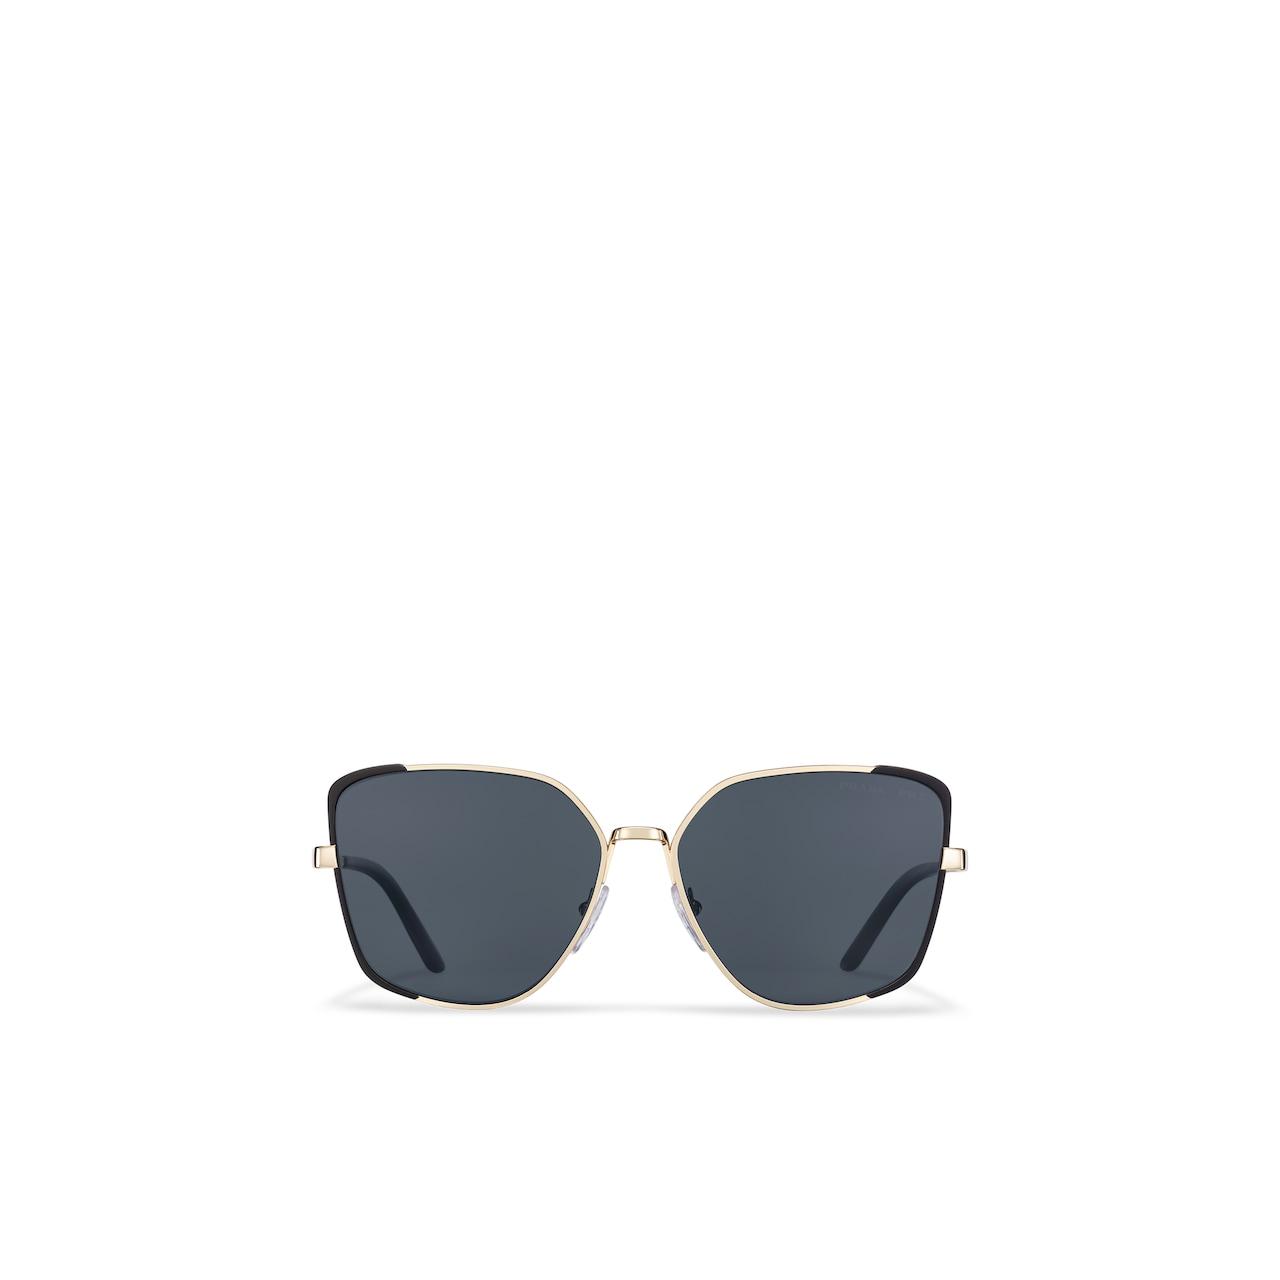 Prada Prada Eyewear 系列太阳镜 1